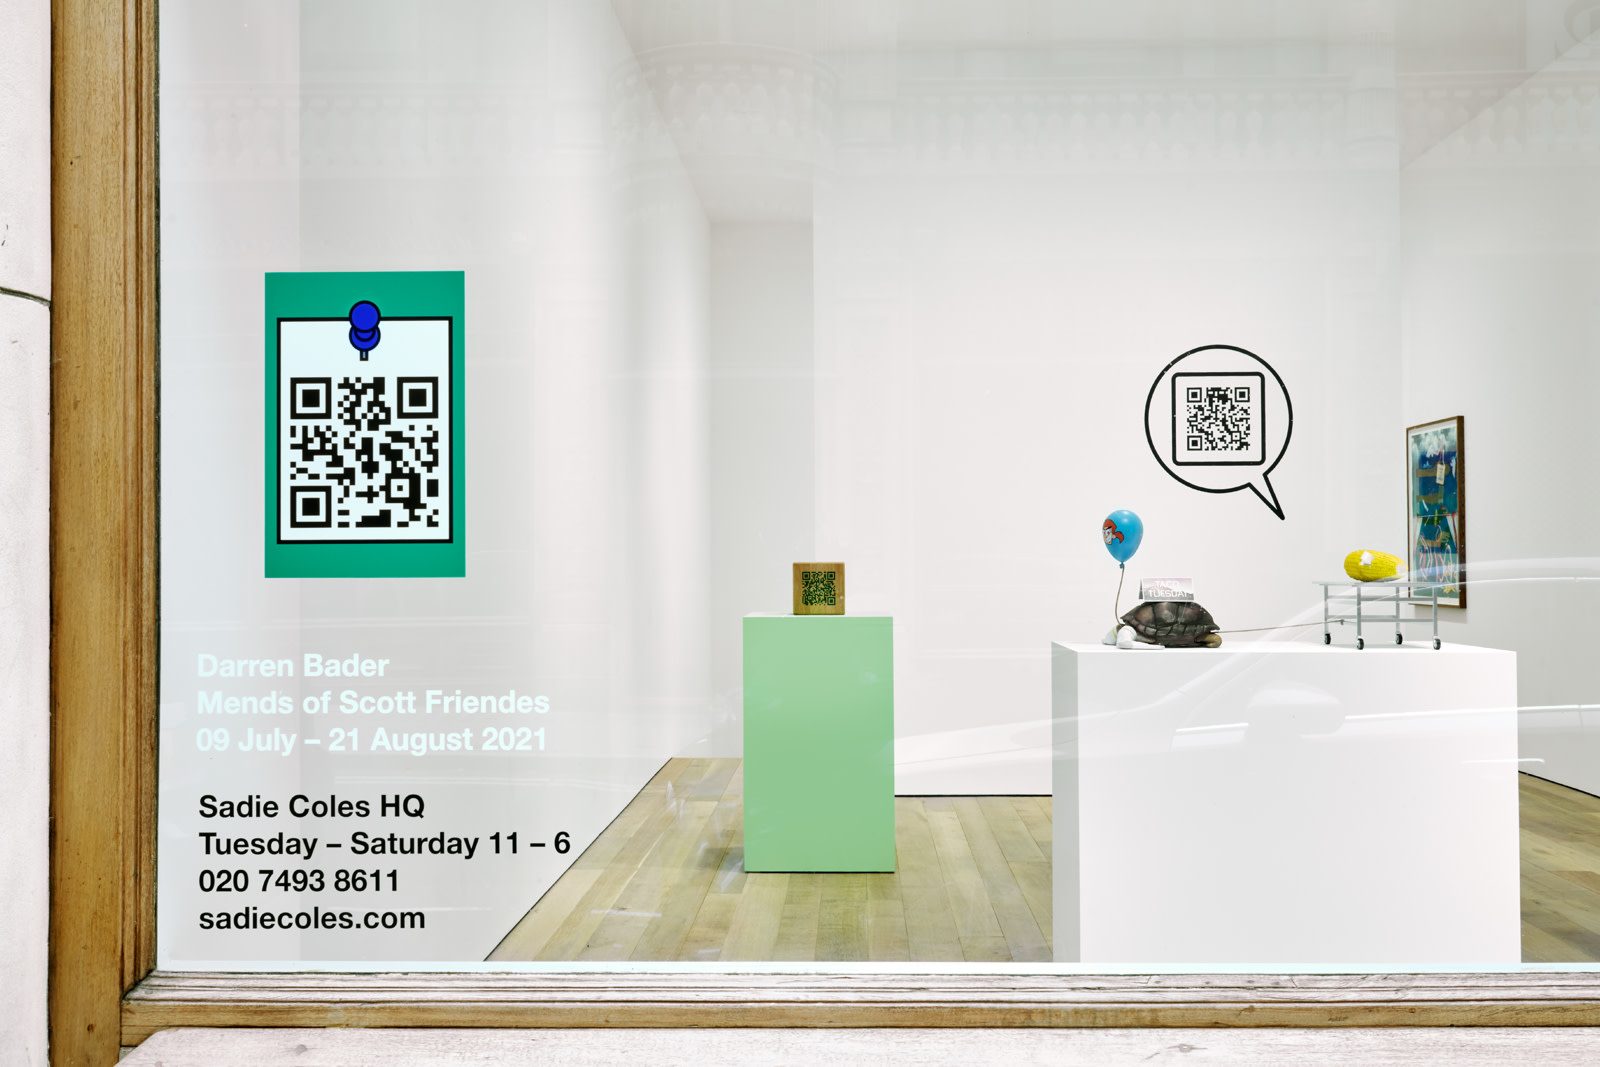 "<div class=""artwork_caption""><p class=""p1"">Installation view,Darren Bader,<i>Mends of Scott Friendes</i>, Sadie Coles HQ, 8 Bury Street SW1Y, 9 July - 21 August 2021</p><p class=""p1"">Photography byRobert Glowacki</p></div>"